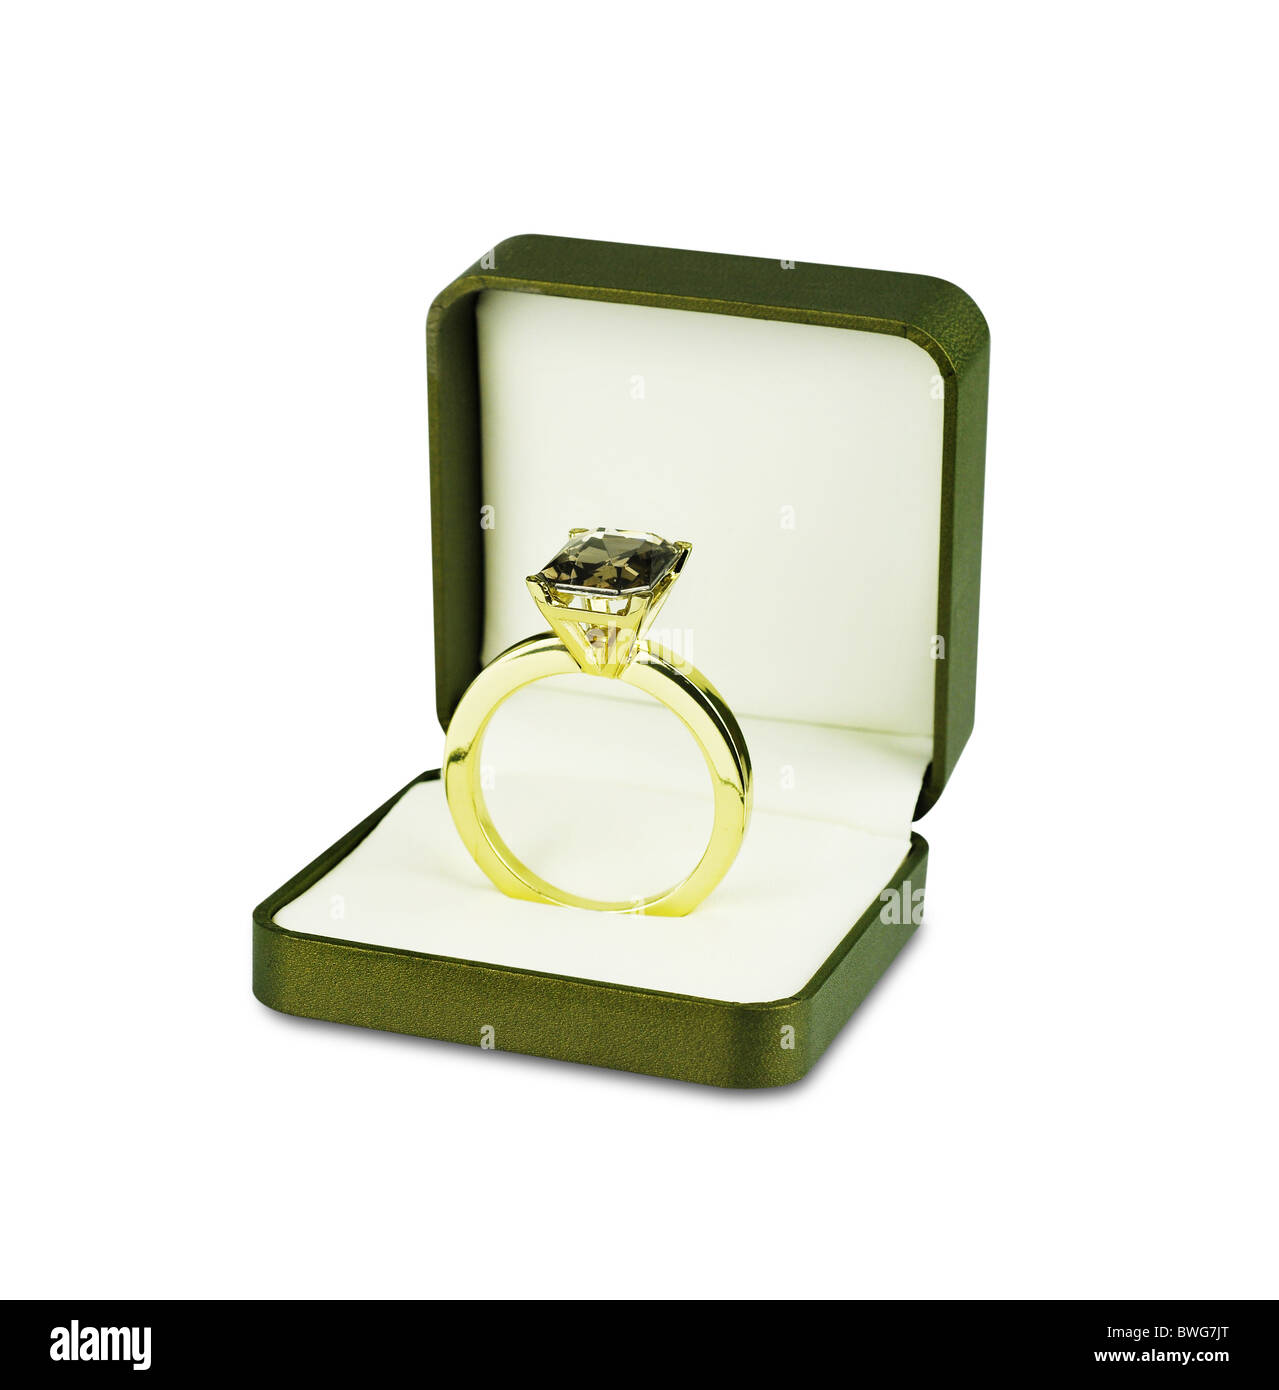 Diamond Ring Inside Jewelry Box Stock Photo 32934016 Alamy